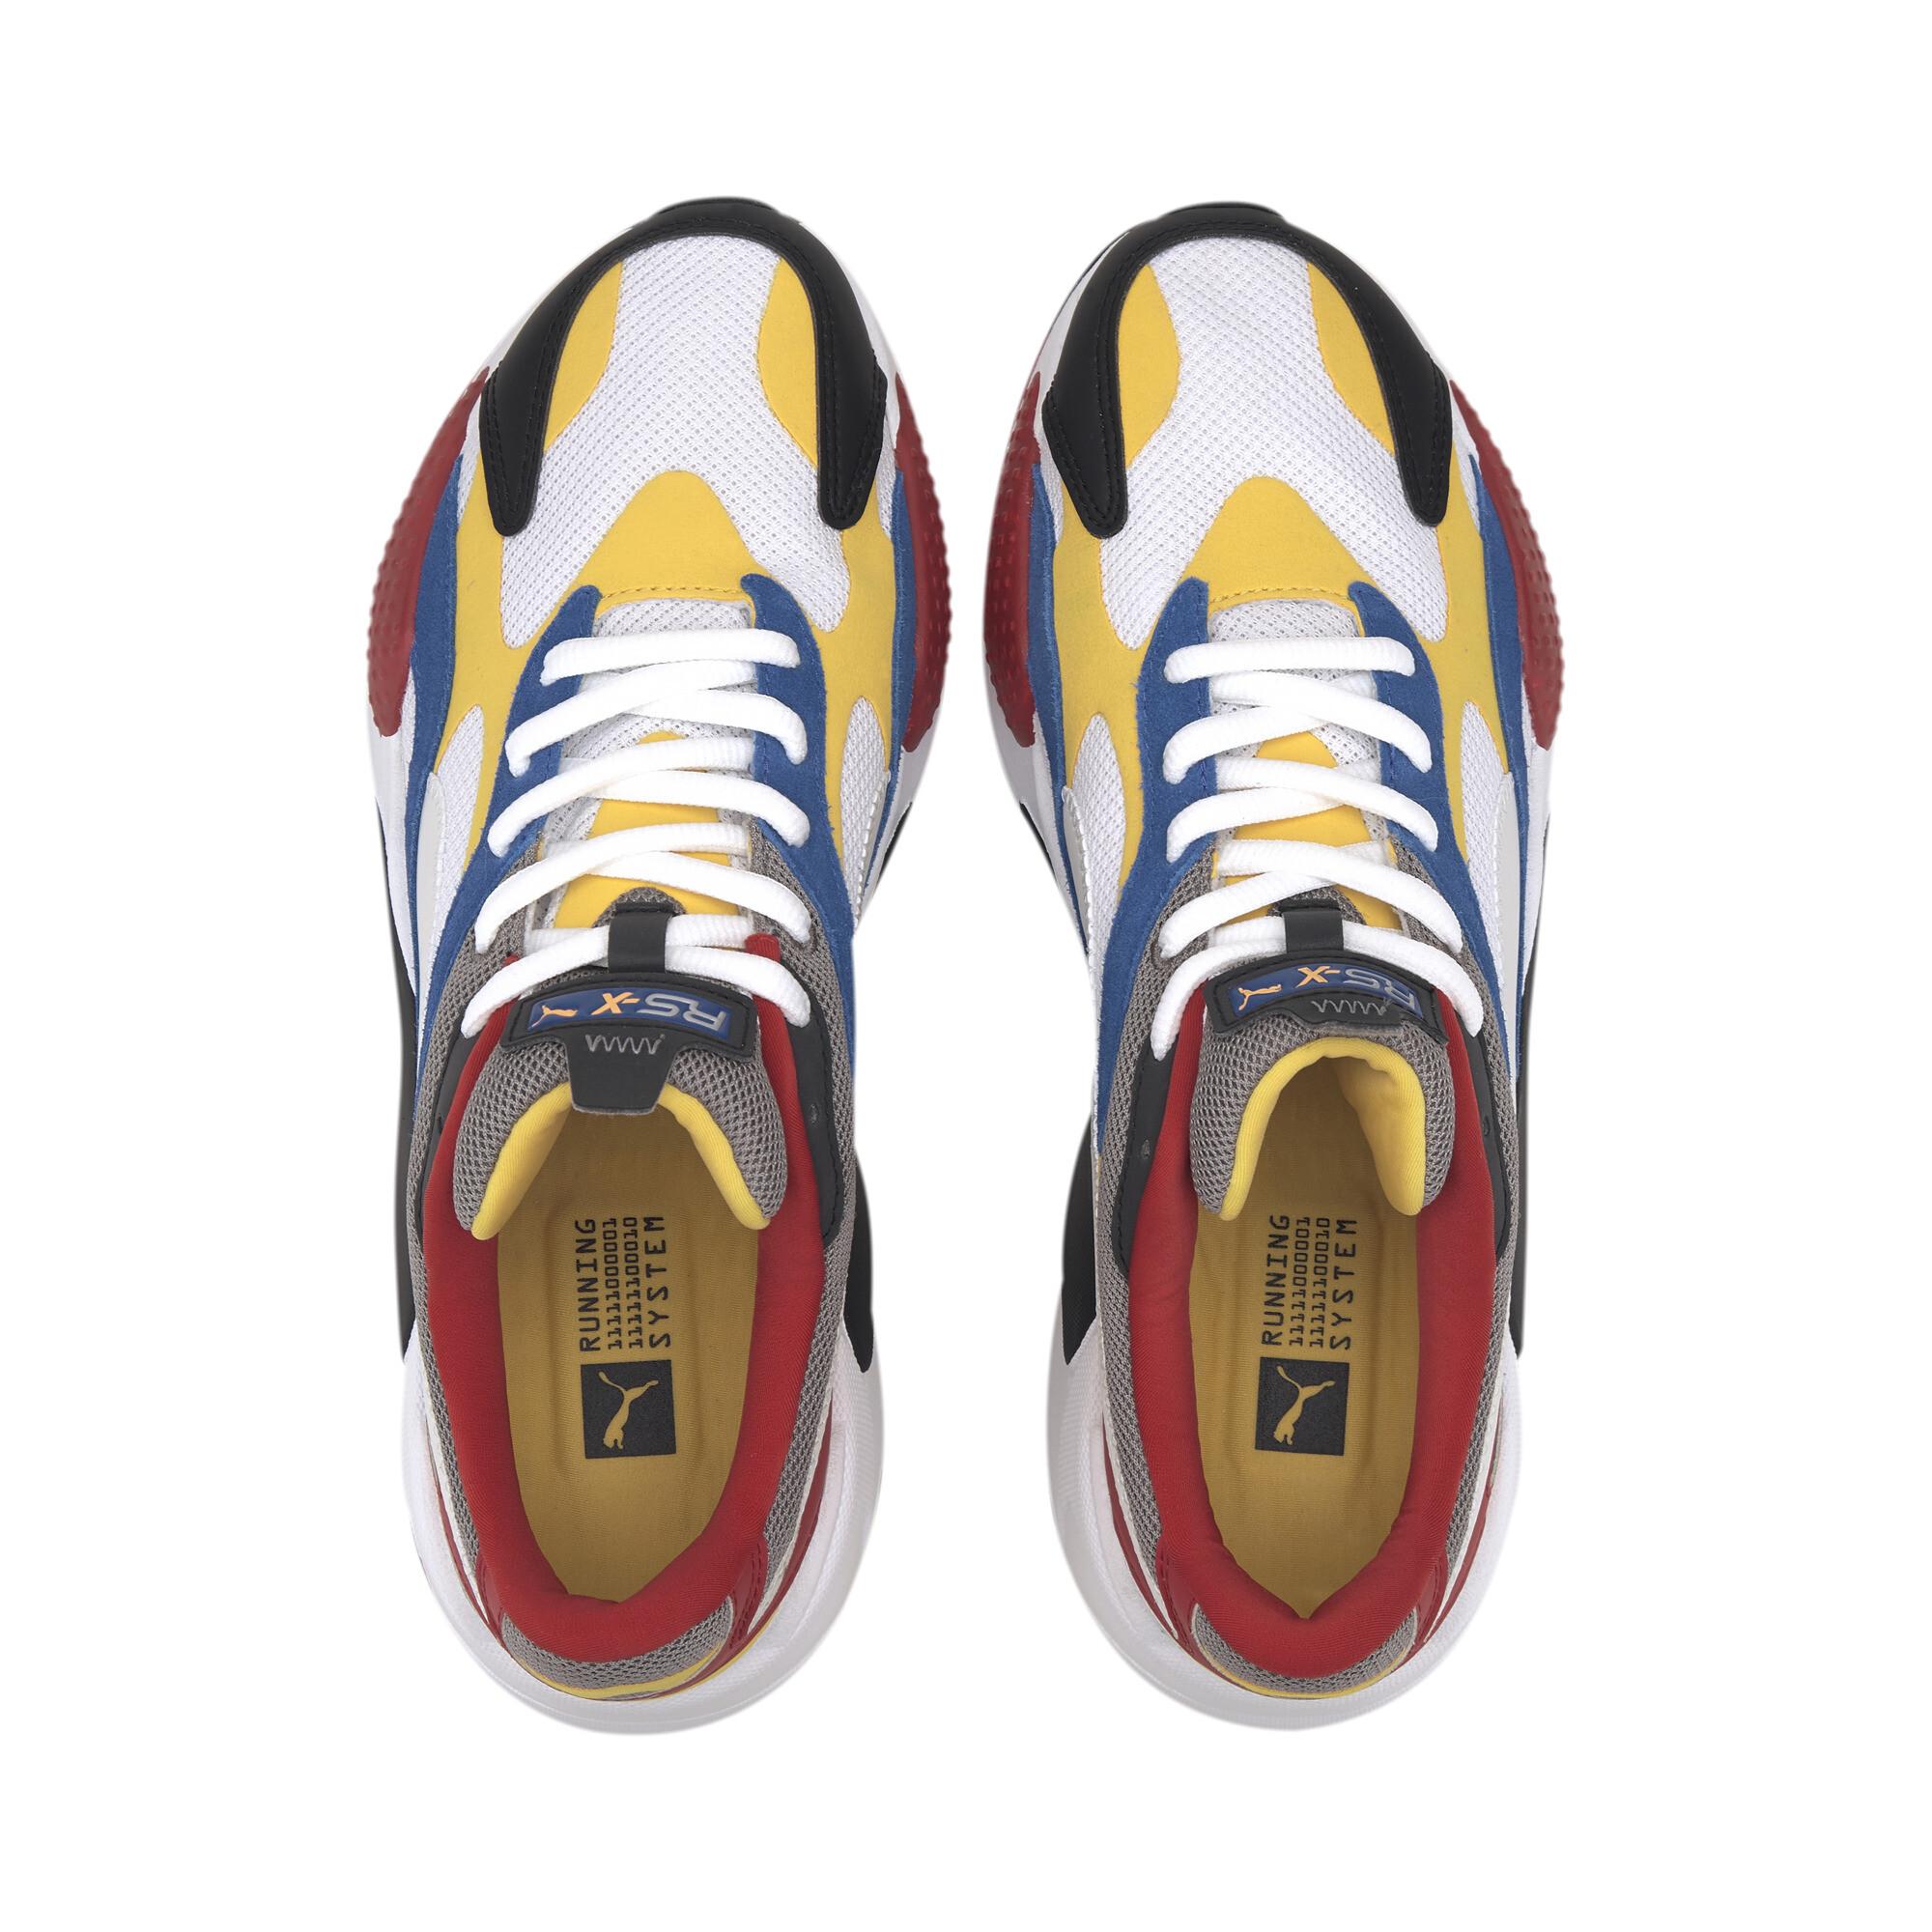 PUMA-Men-039-s-RS-X-Puzzle-Sneakers thumbnail 33